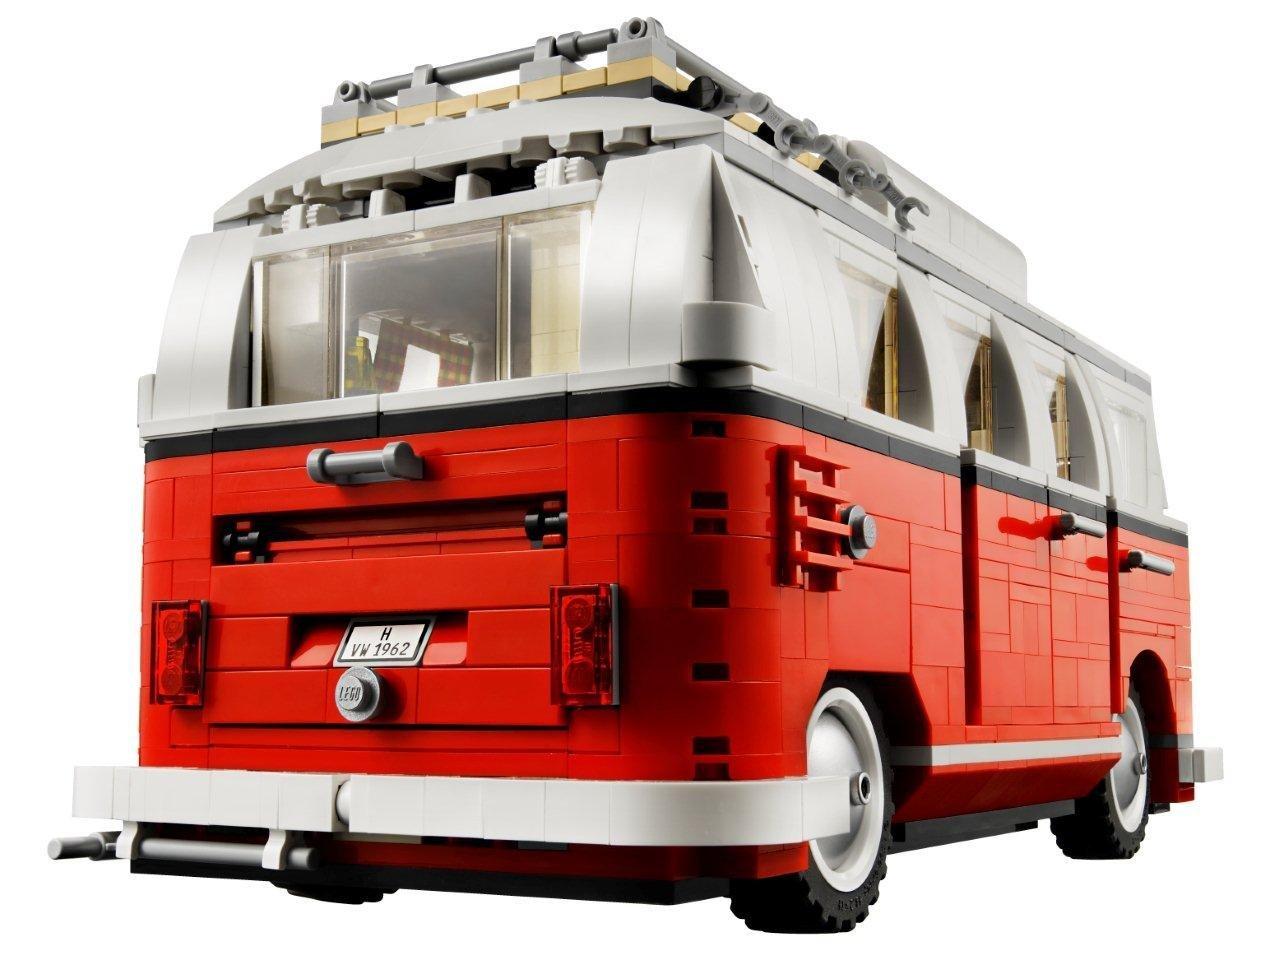 catawiki kavels caravan transporter vw for camper van volkswagen lego